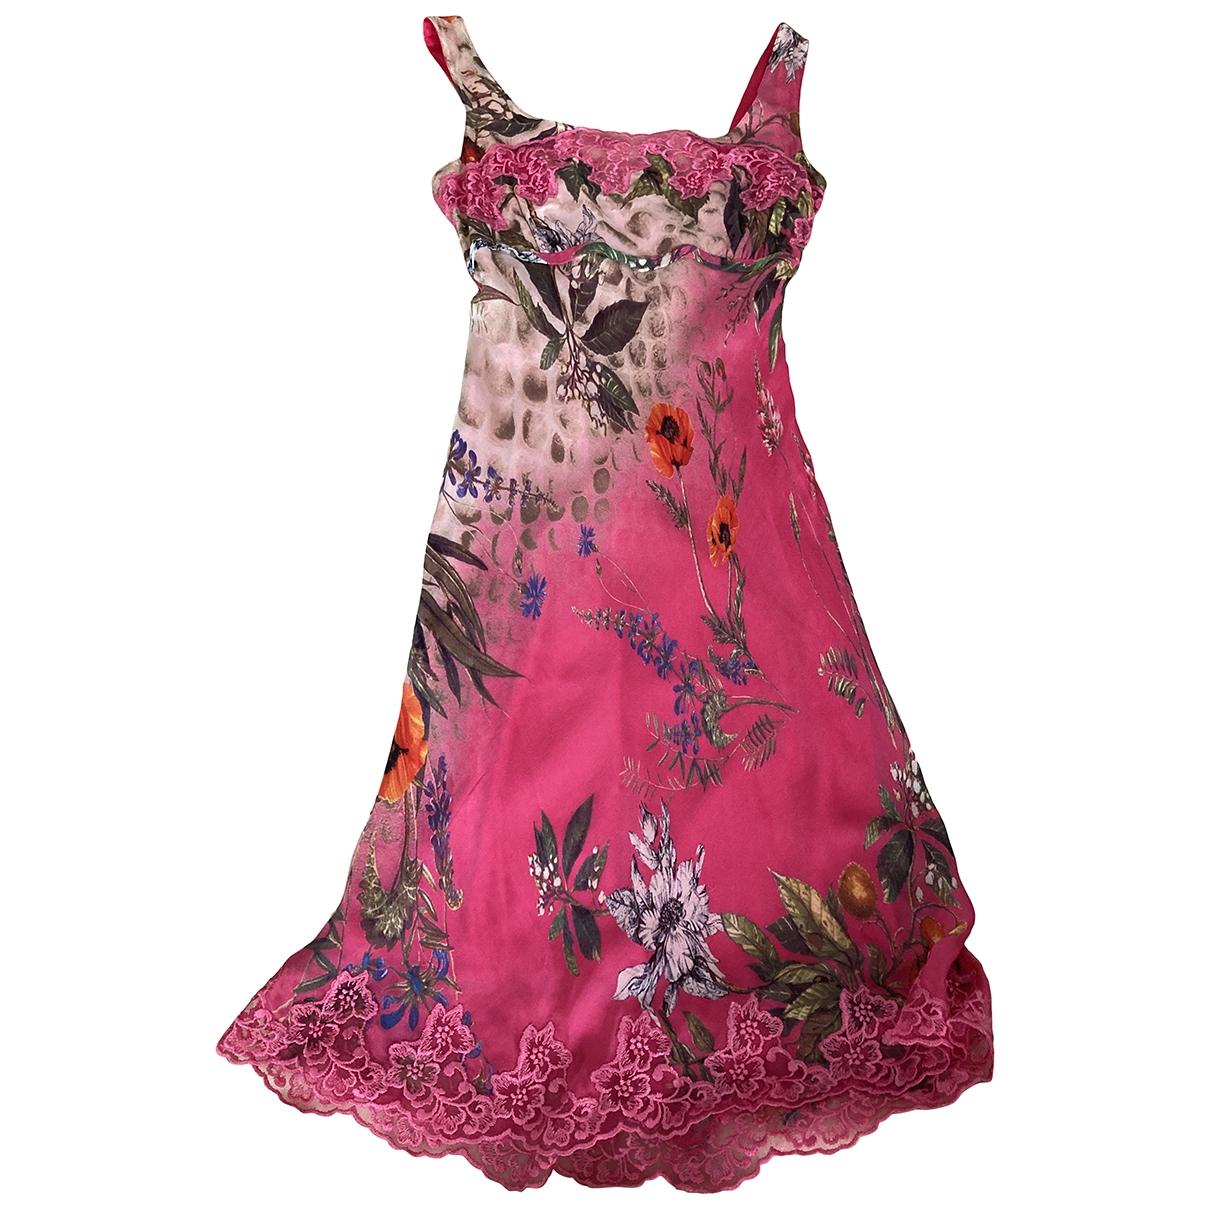 Class Cavalli \N Multicolour Silk dress for Women 38 IT